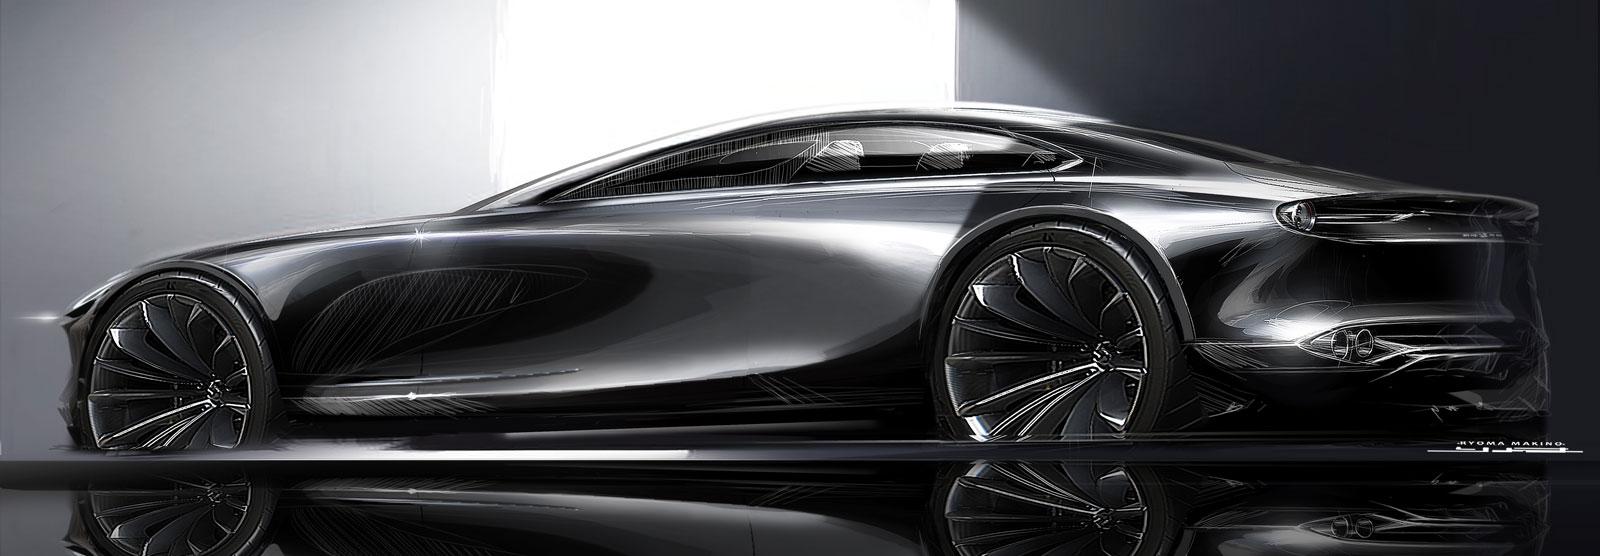 Mazda Vision Coupe Concept Design Sketch Render Car Body